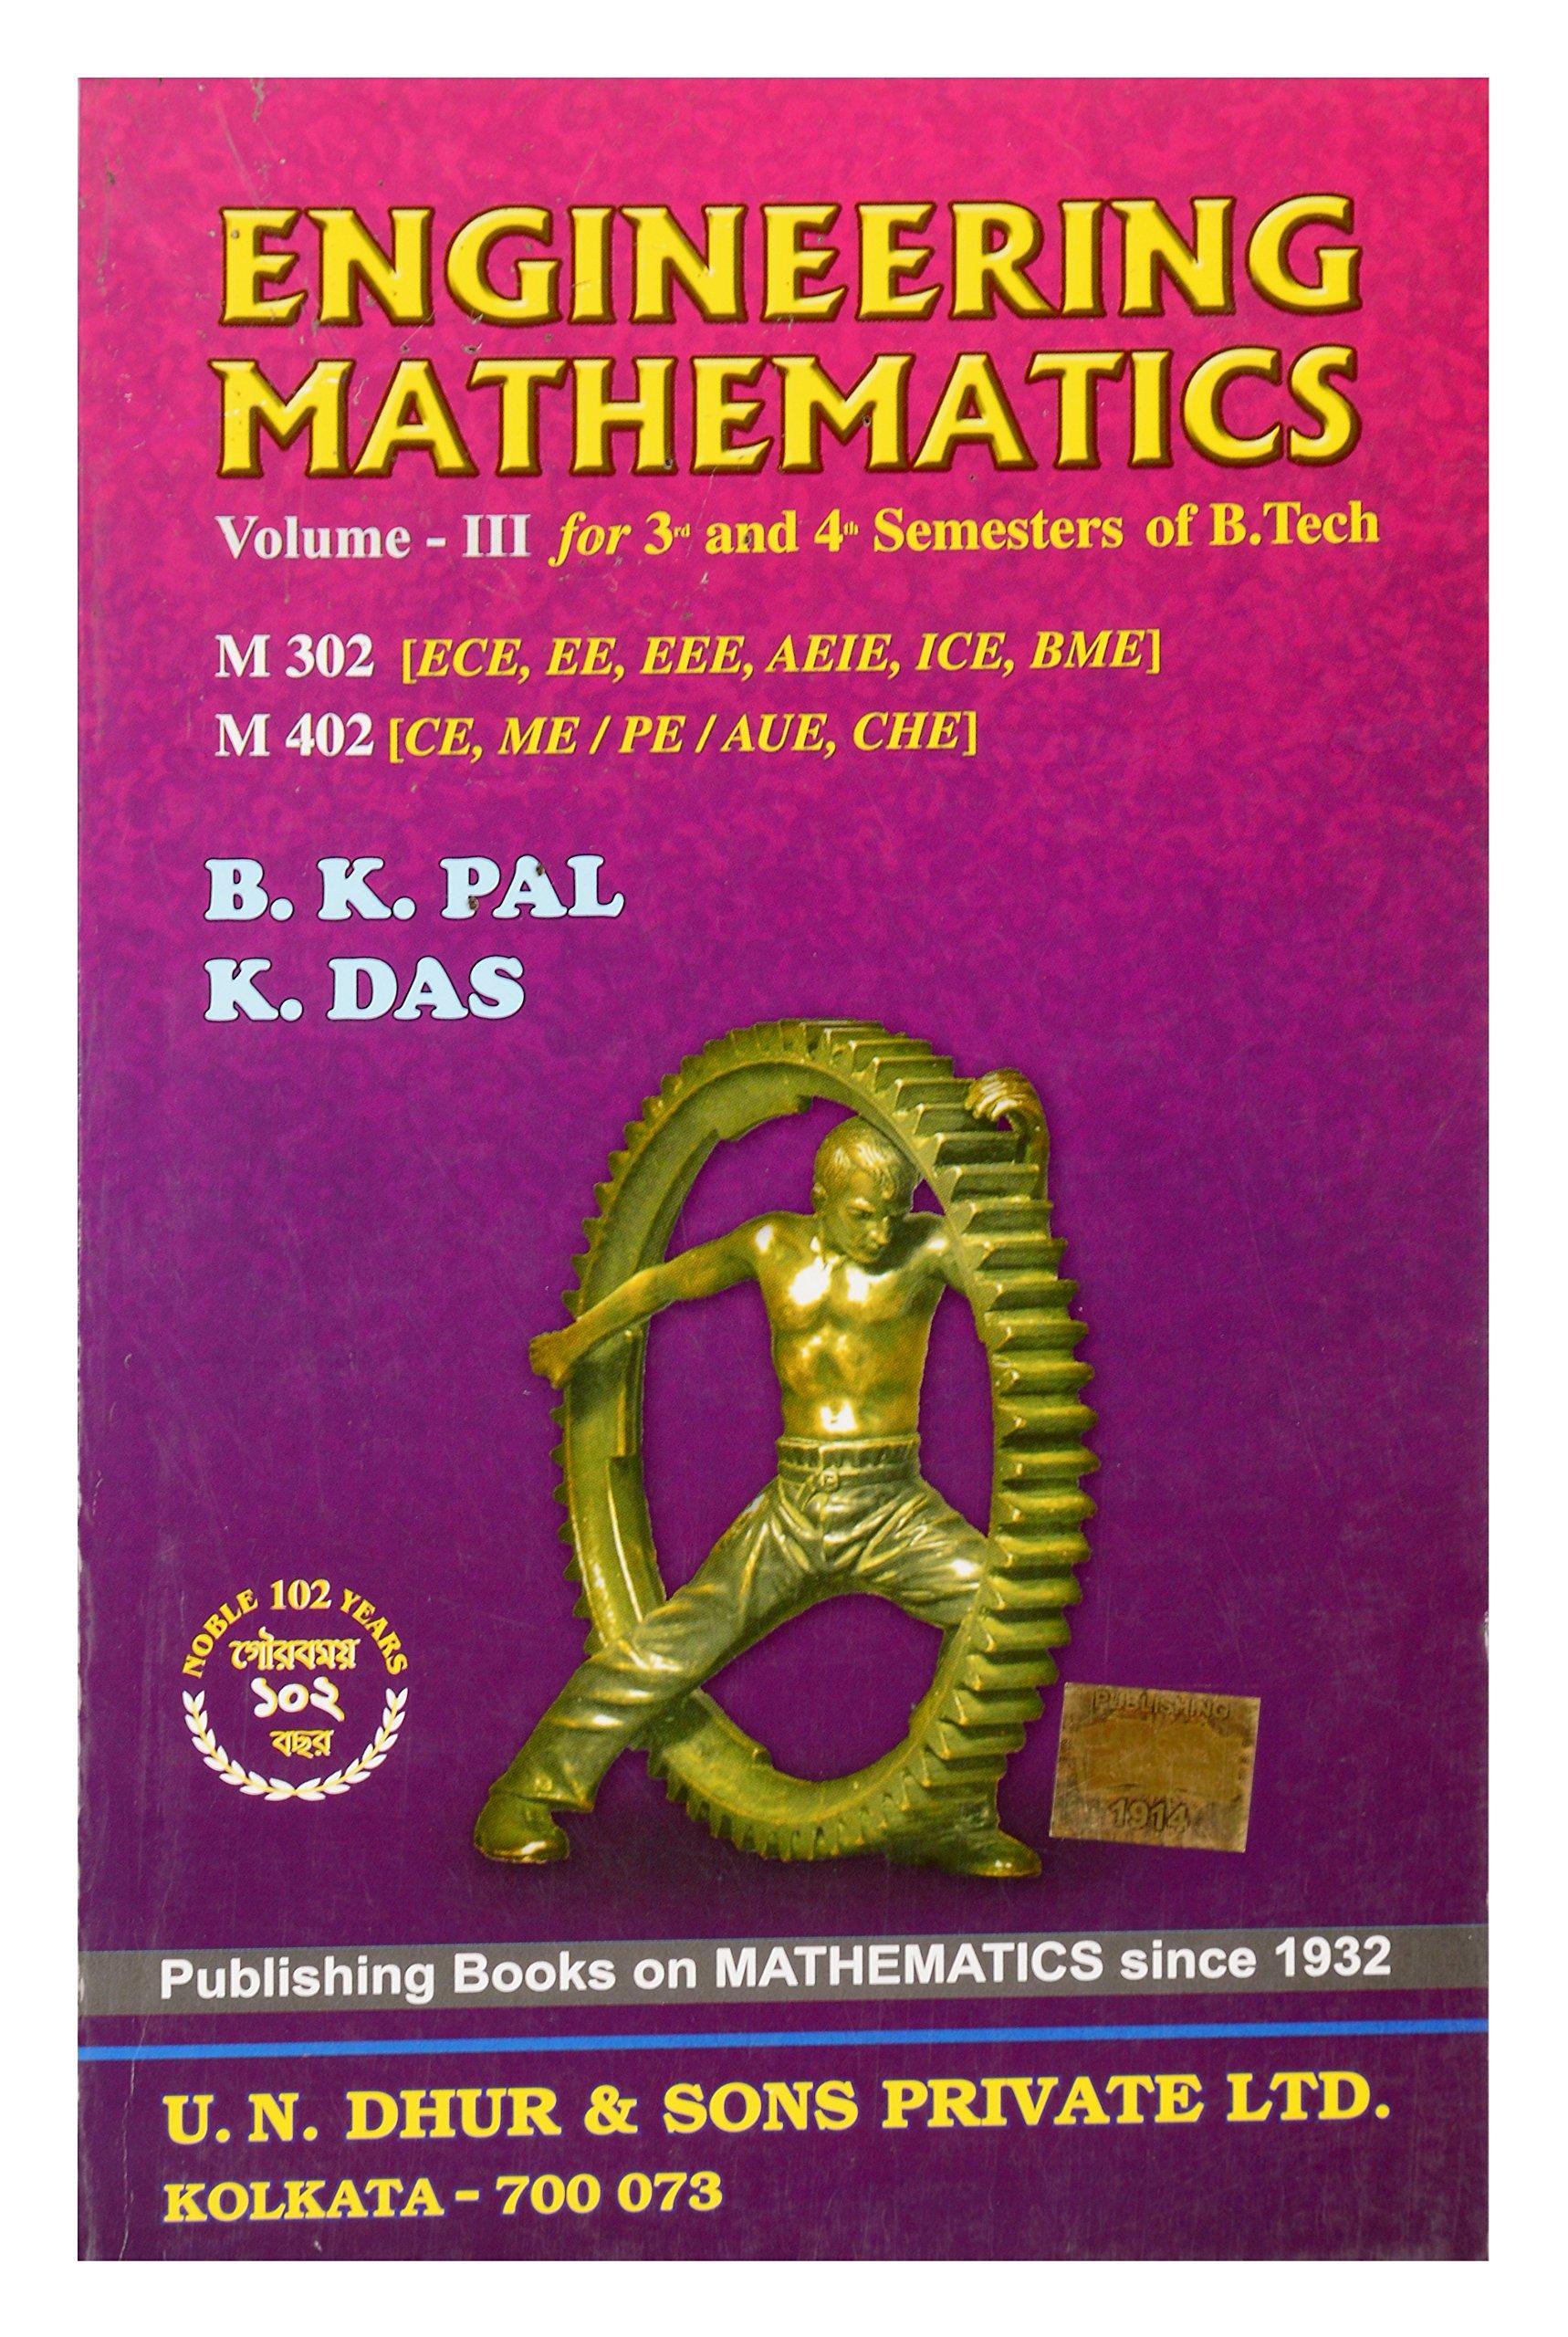 engineering mathematics das pal vol 1 free download